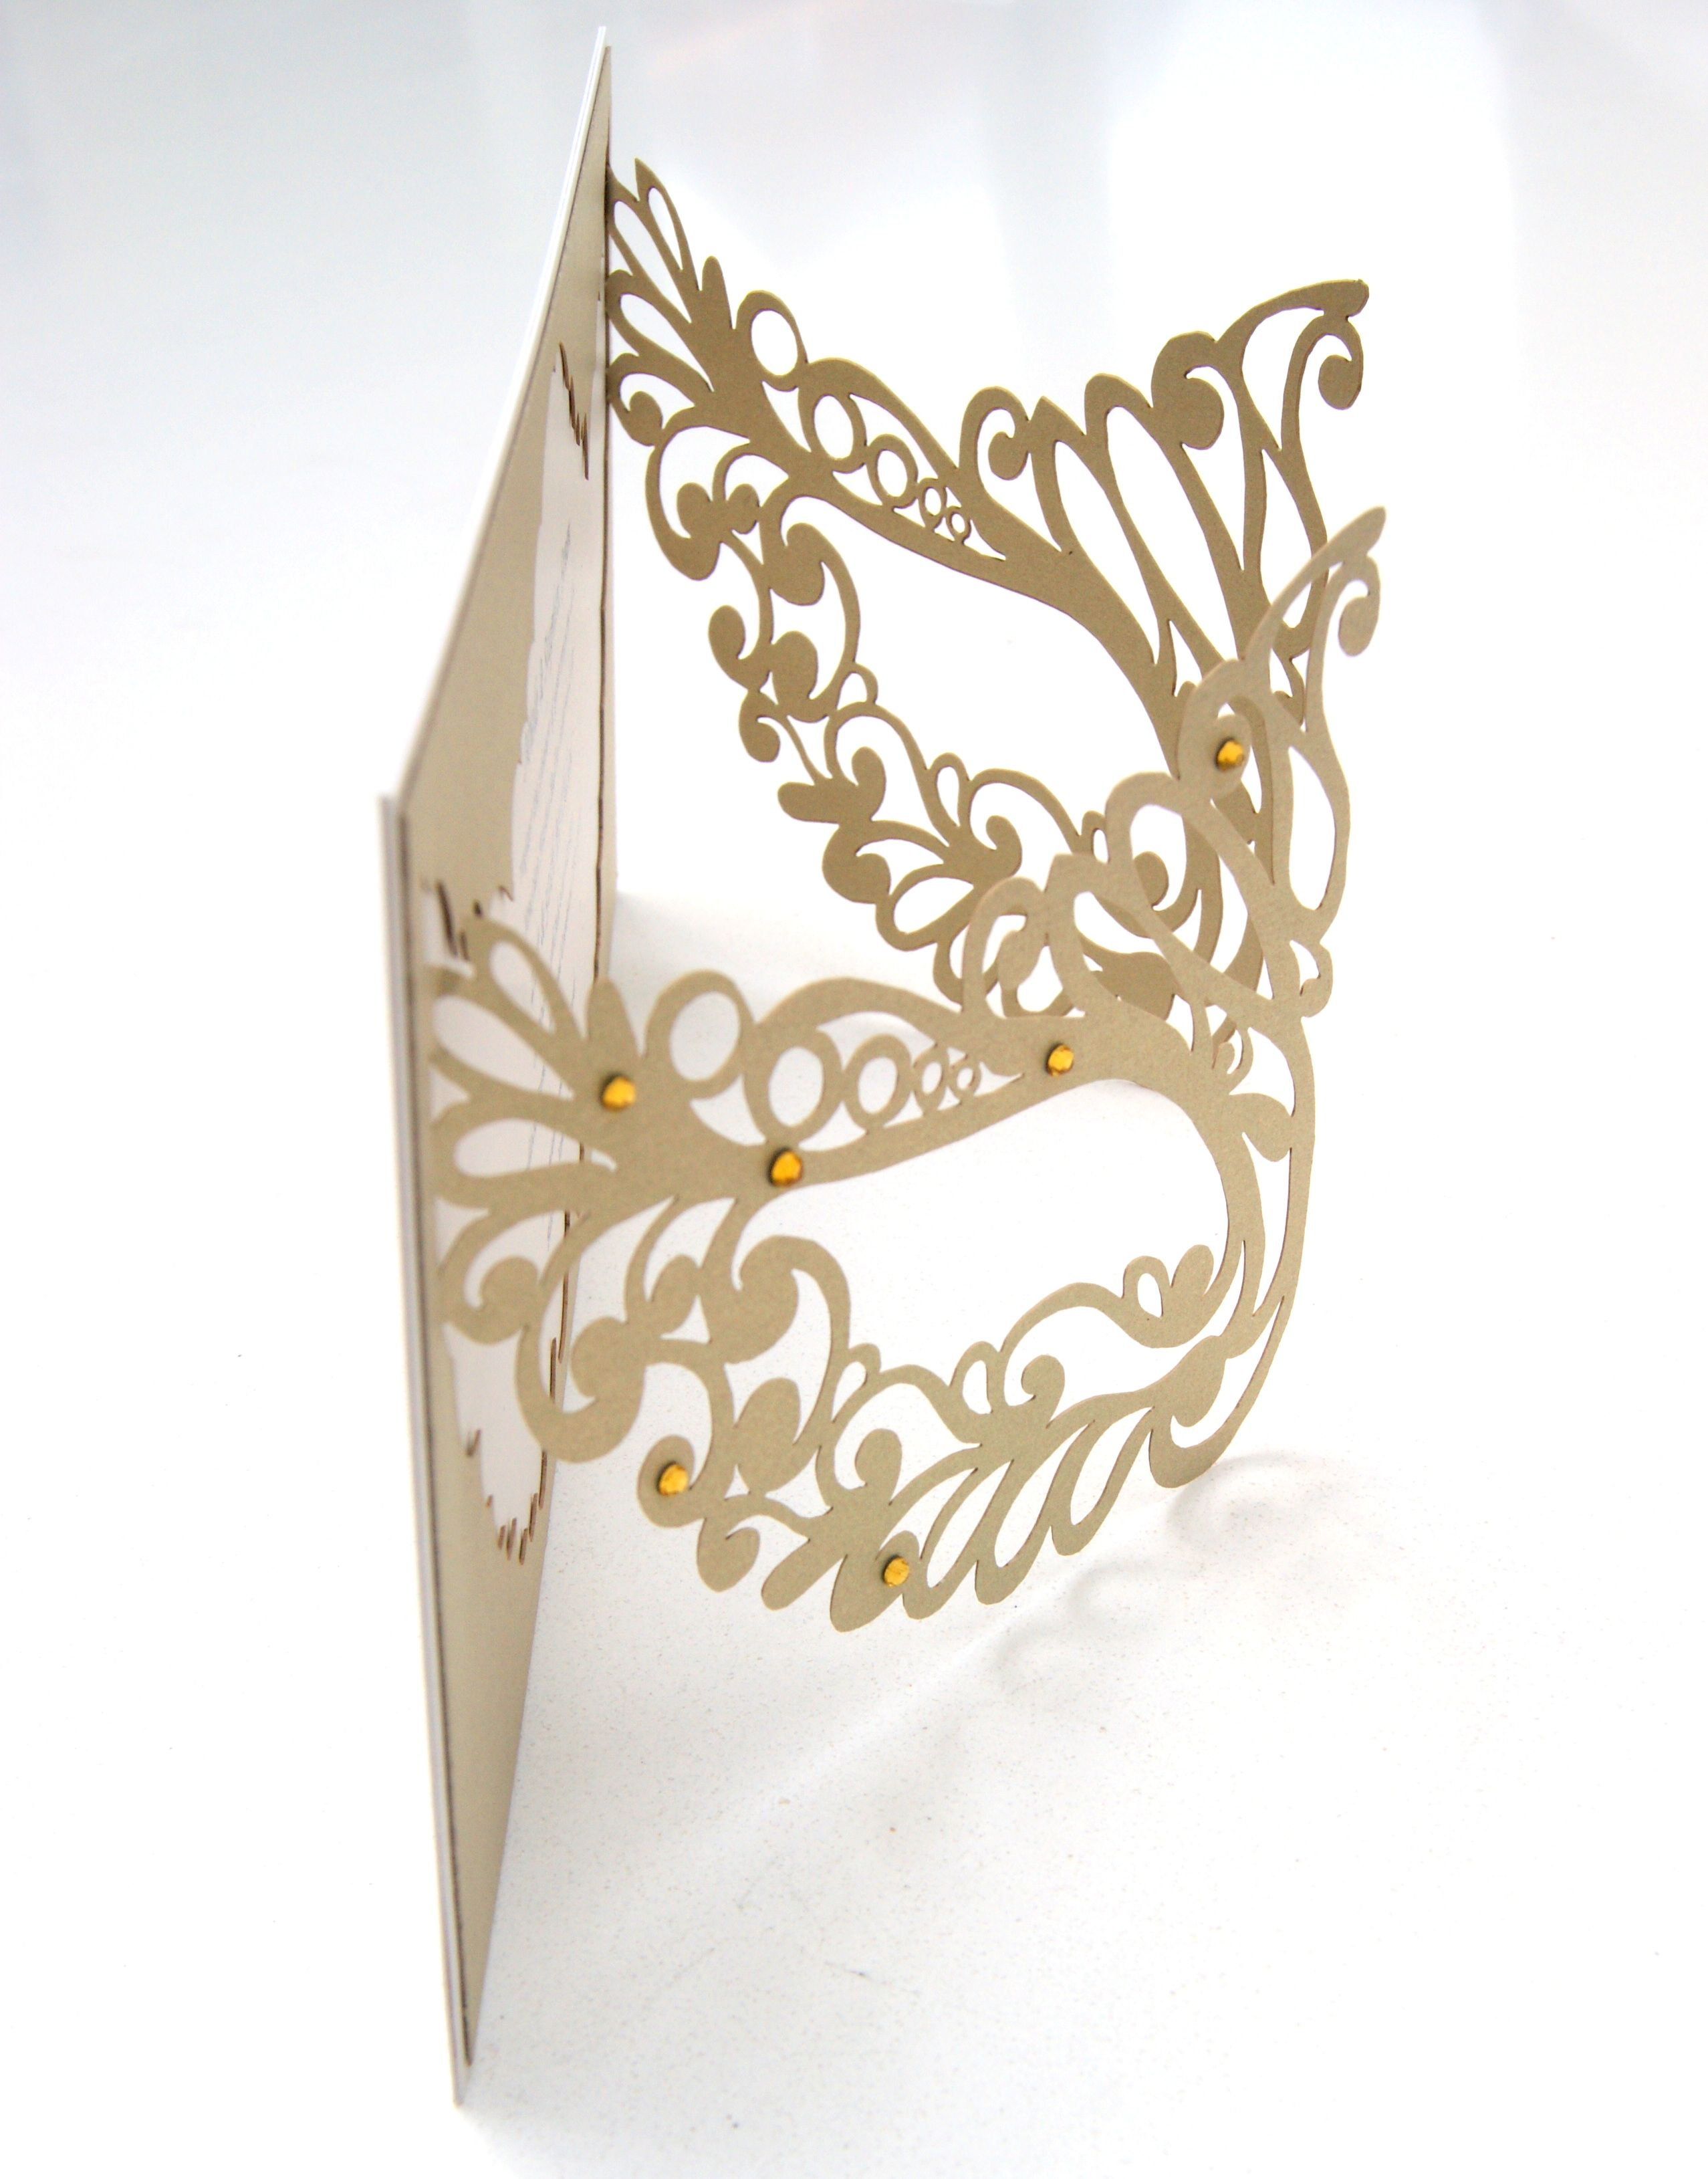 Mardi gras mask party invitation laser cut masquerade ball wedding – Mask Invitations Masquerade Party